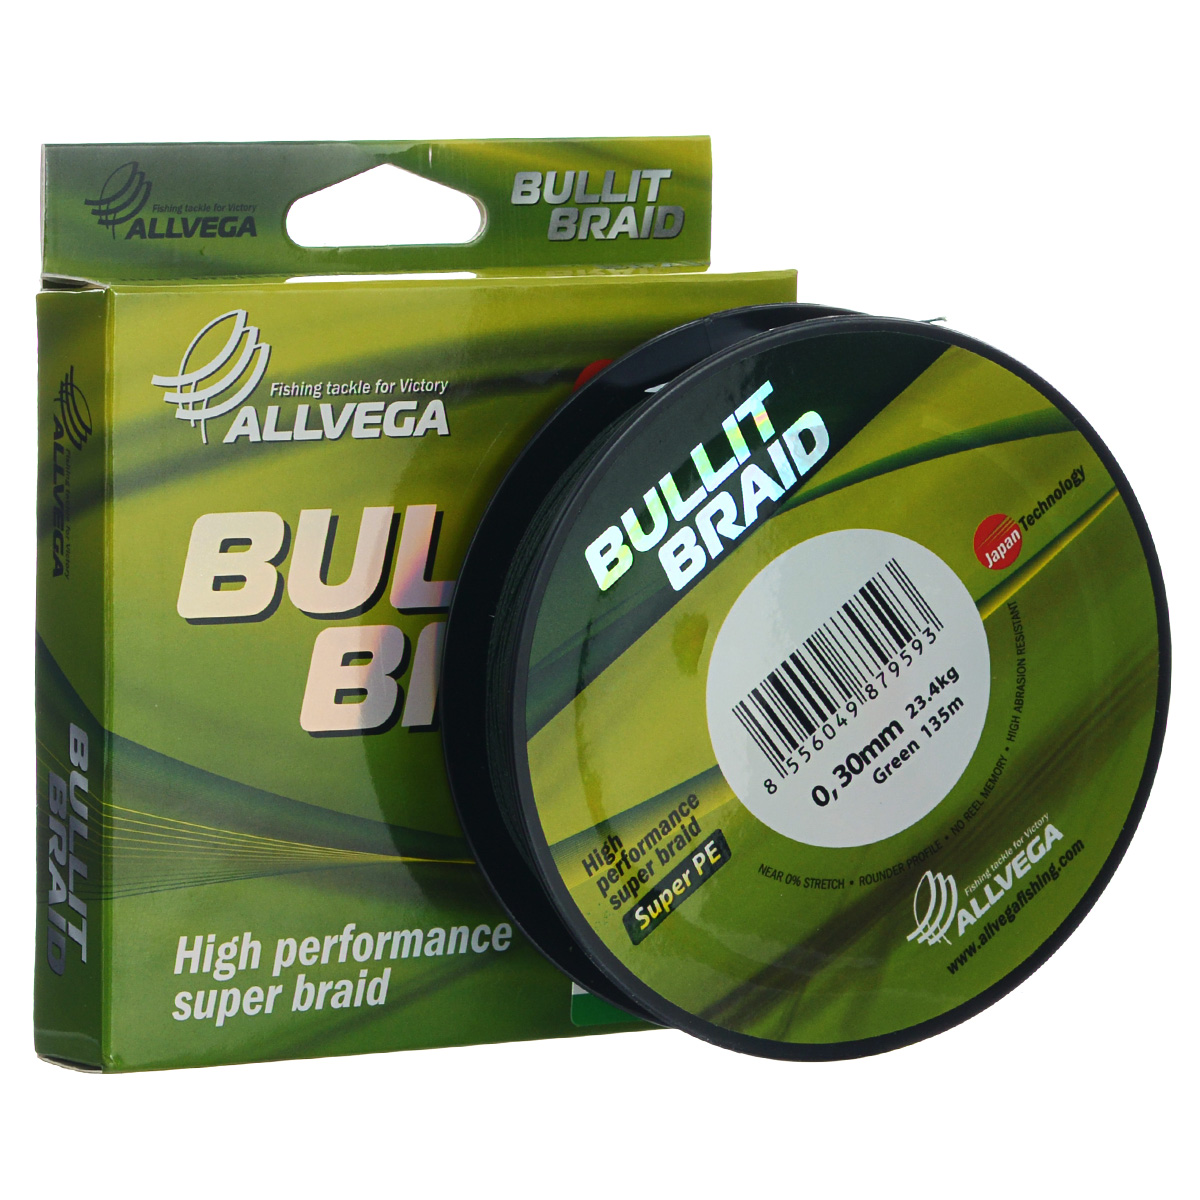 Леска плетеная Allvega  Bullit Braid , цвет: темно-зеленый, 135 м, 0,3 мм, 23,4 кг - Рыбалка